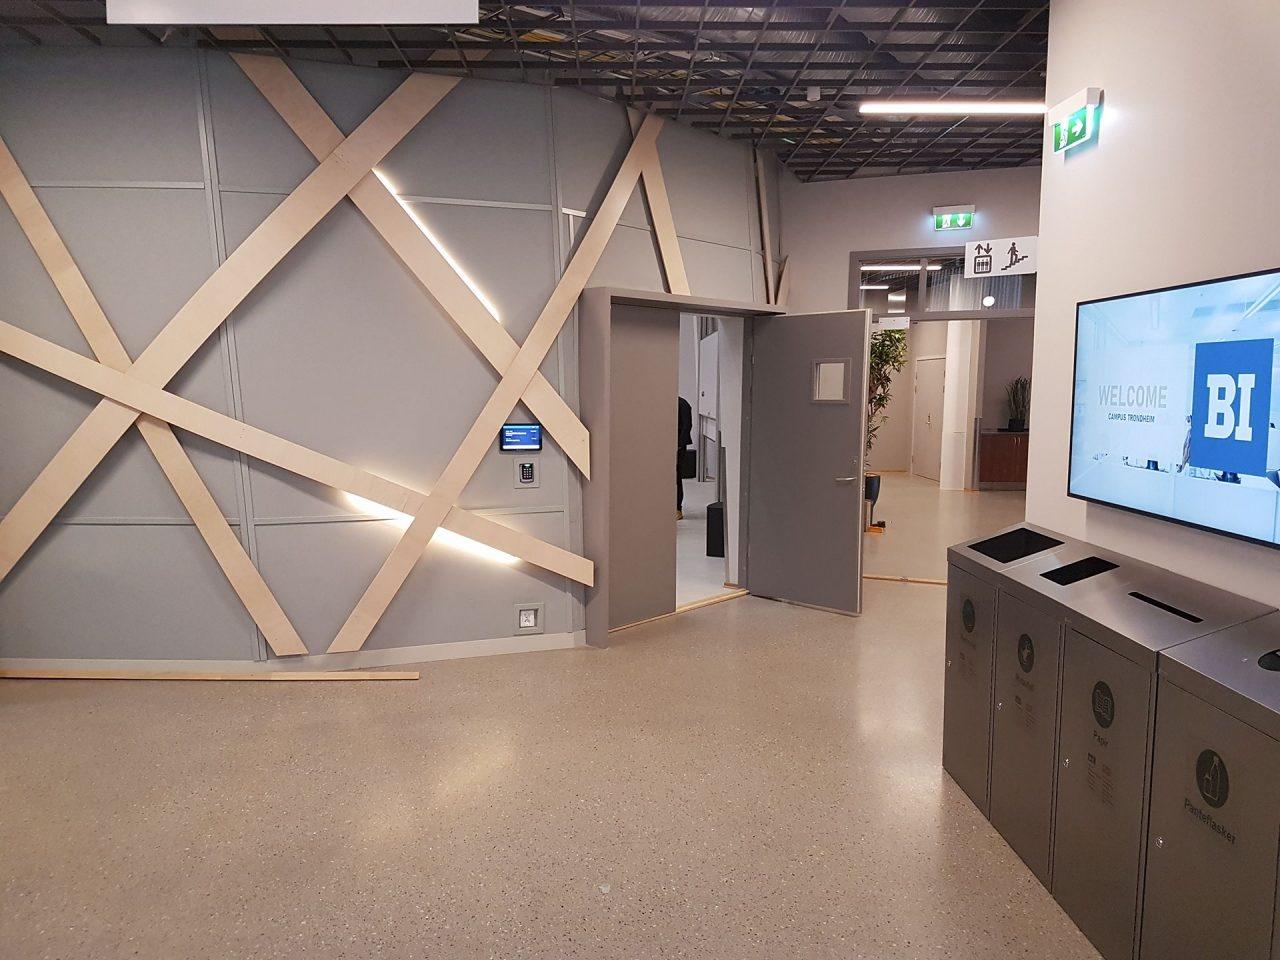 Handelshoyskolen-BI-Trondheim-displaysystem-room-manager4-1280x960